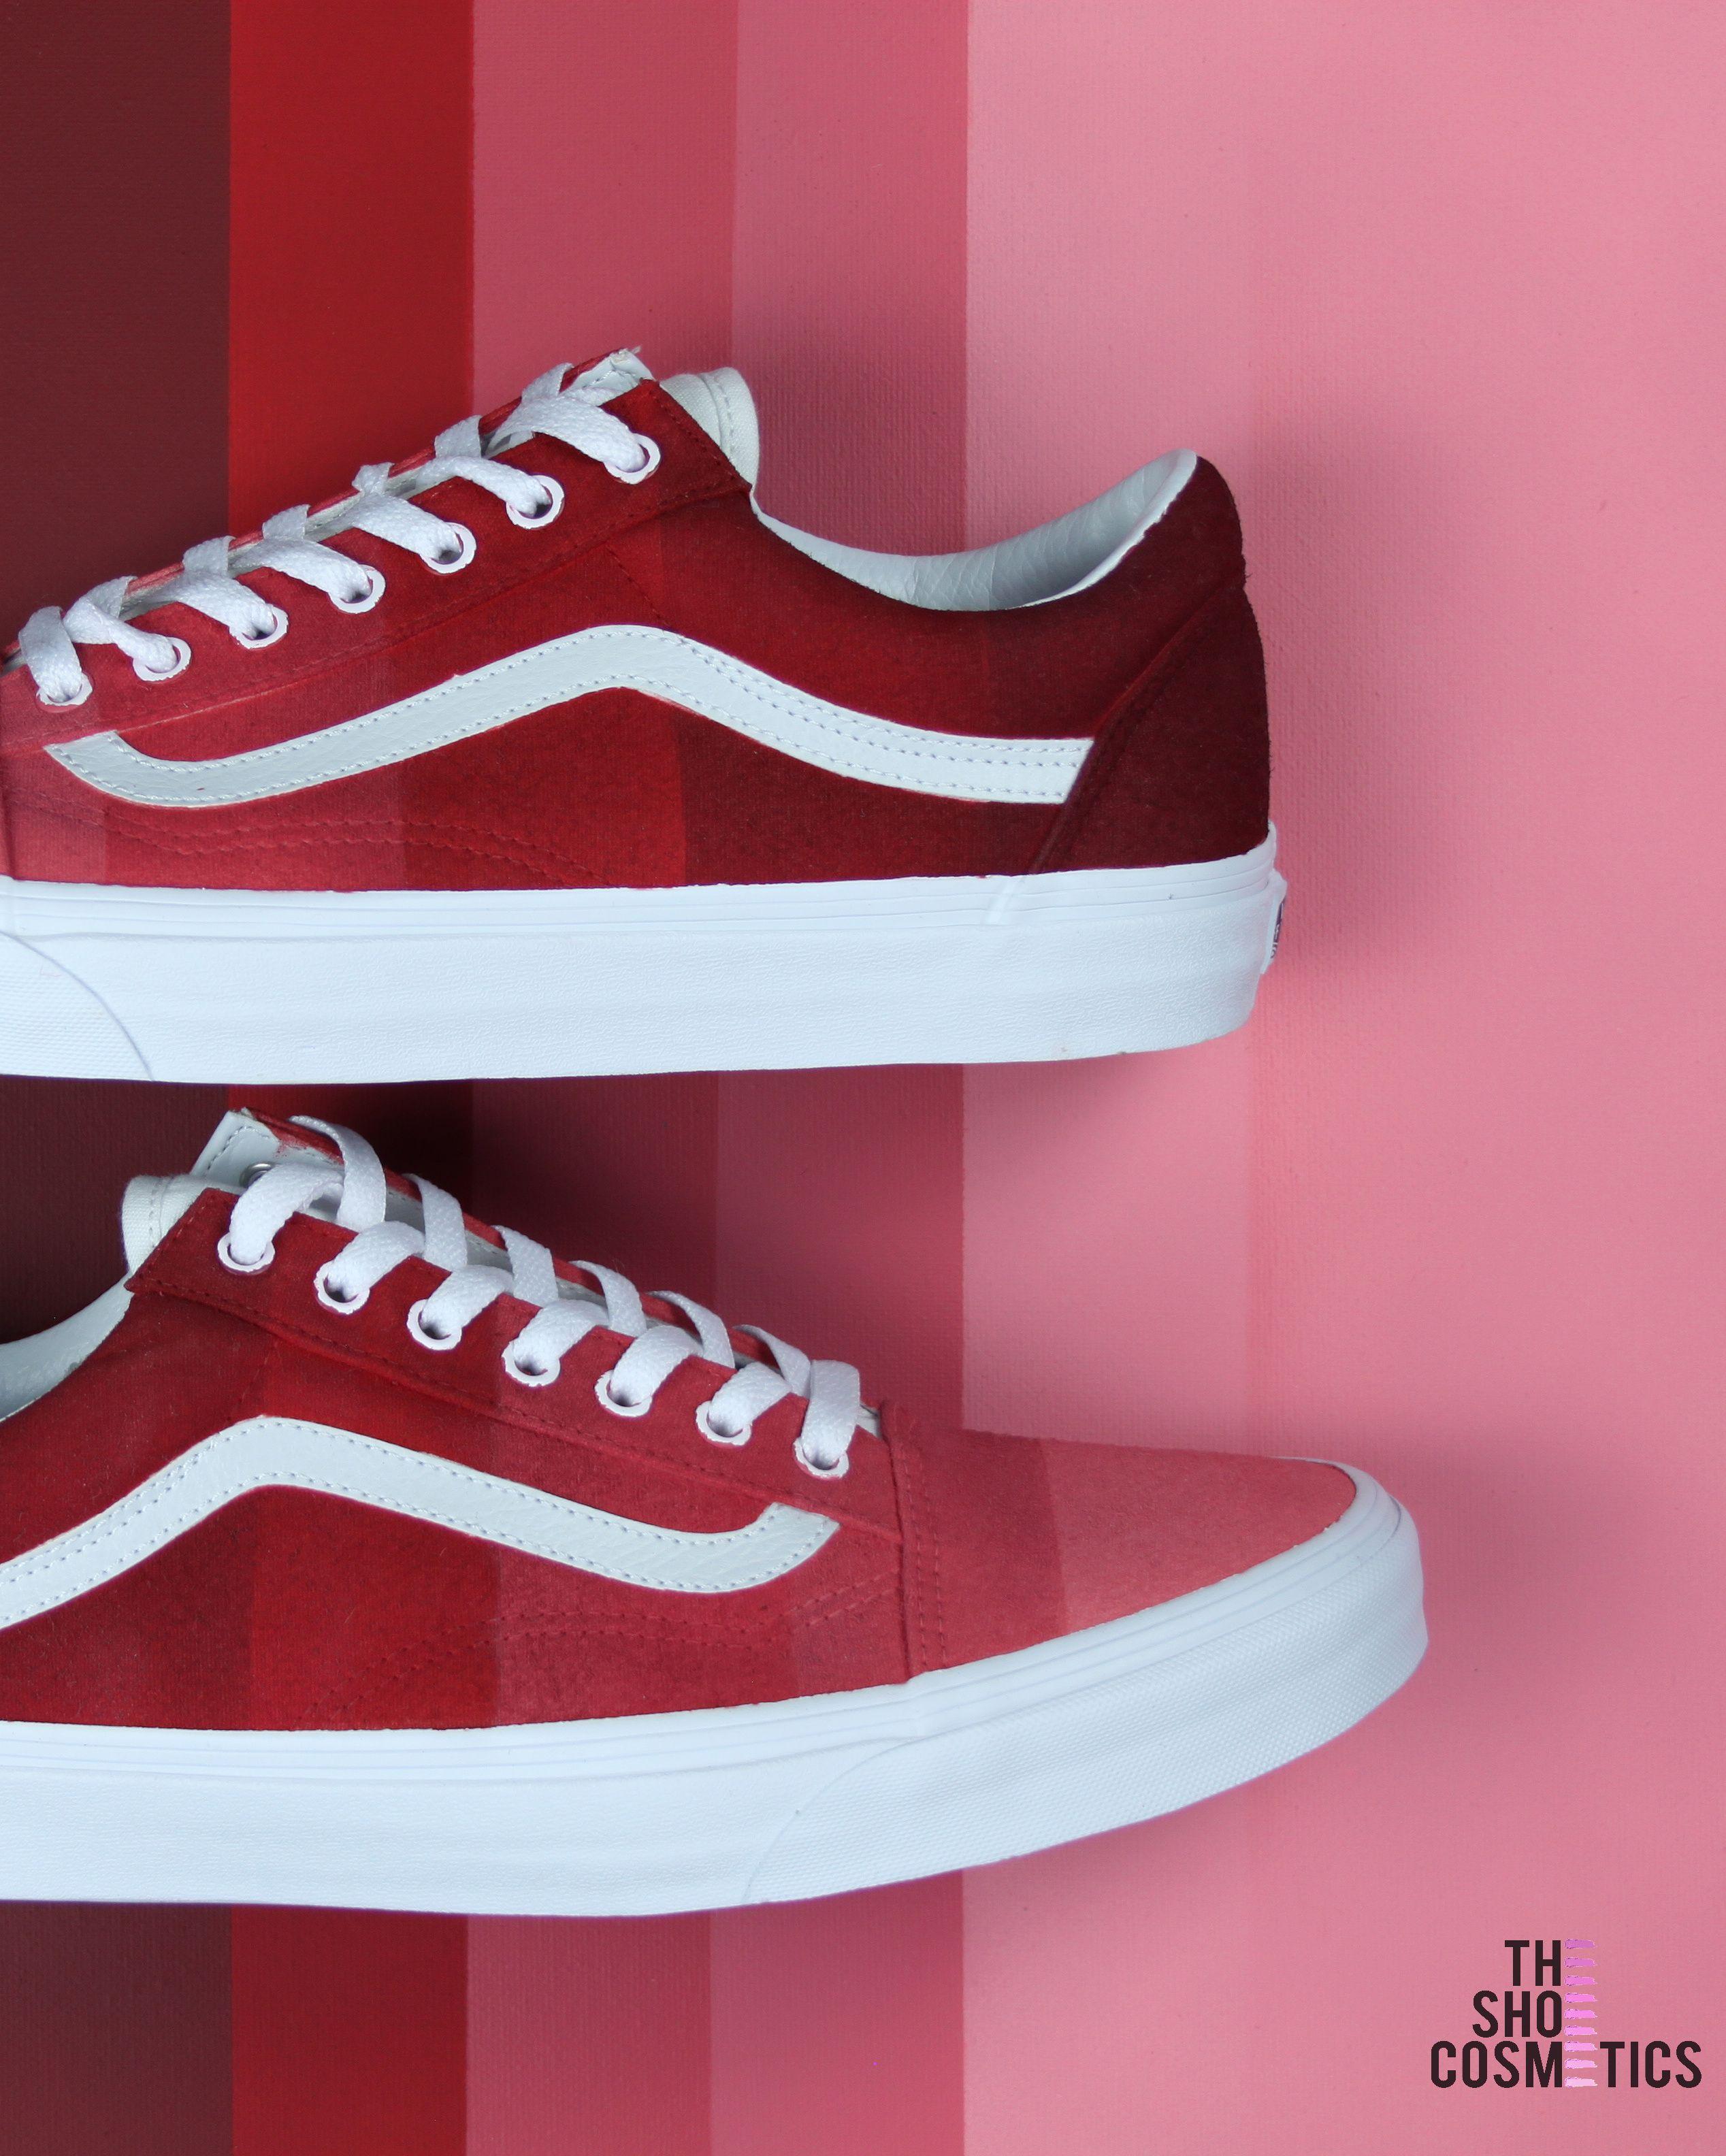 e1bdca0a197 Looking for red vans  Explore our custom Vans Old Skool sneakers in this red  palette ombre design. If you love the Old Skool Vans then these Custom Vans  ...